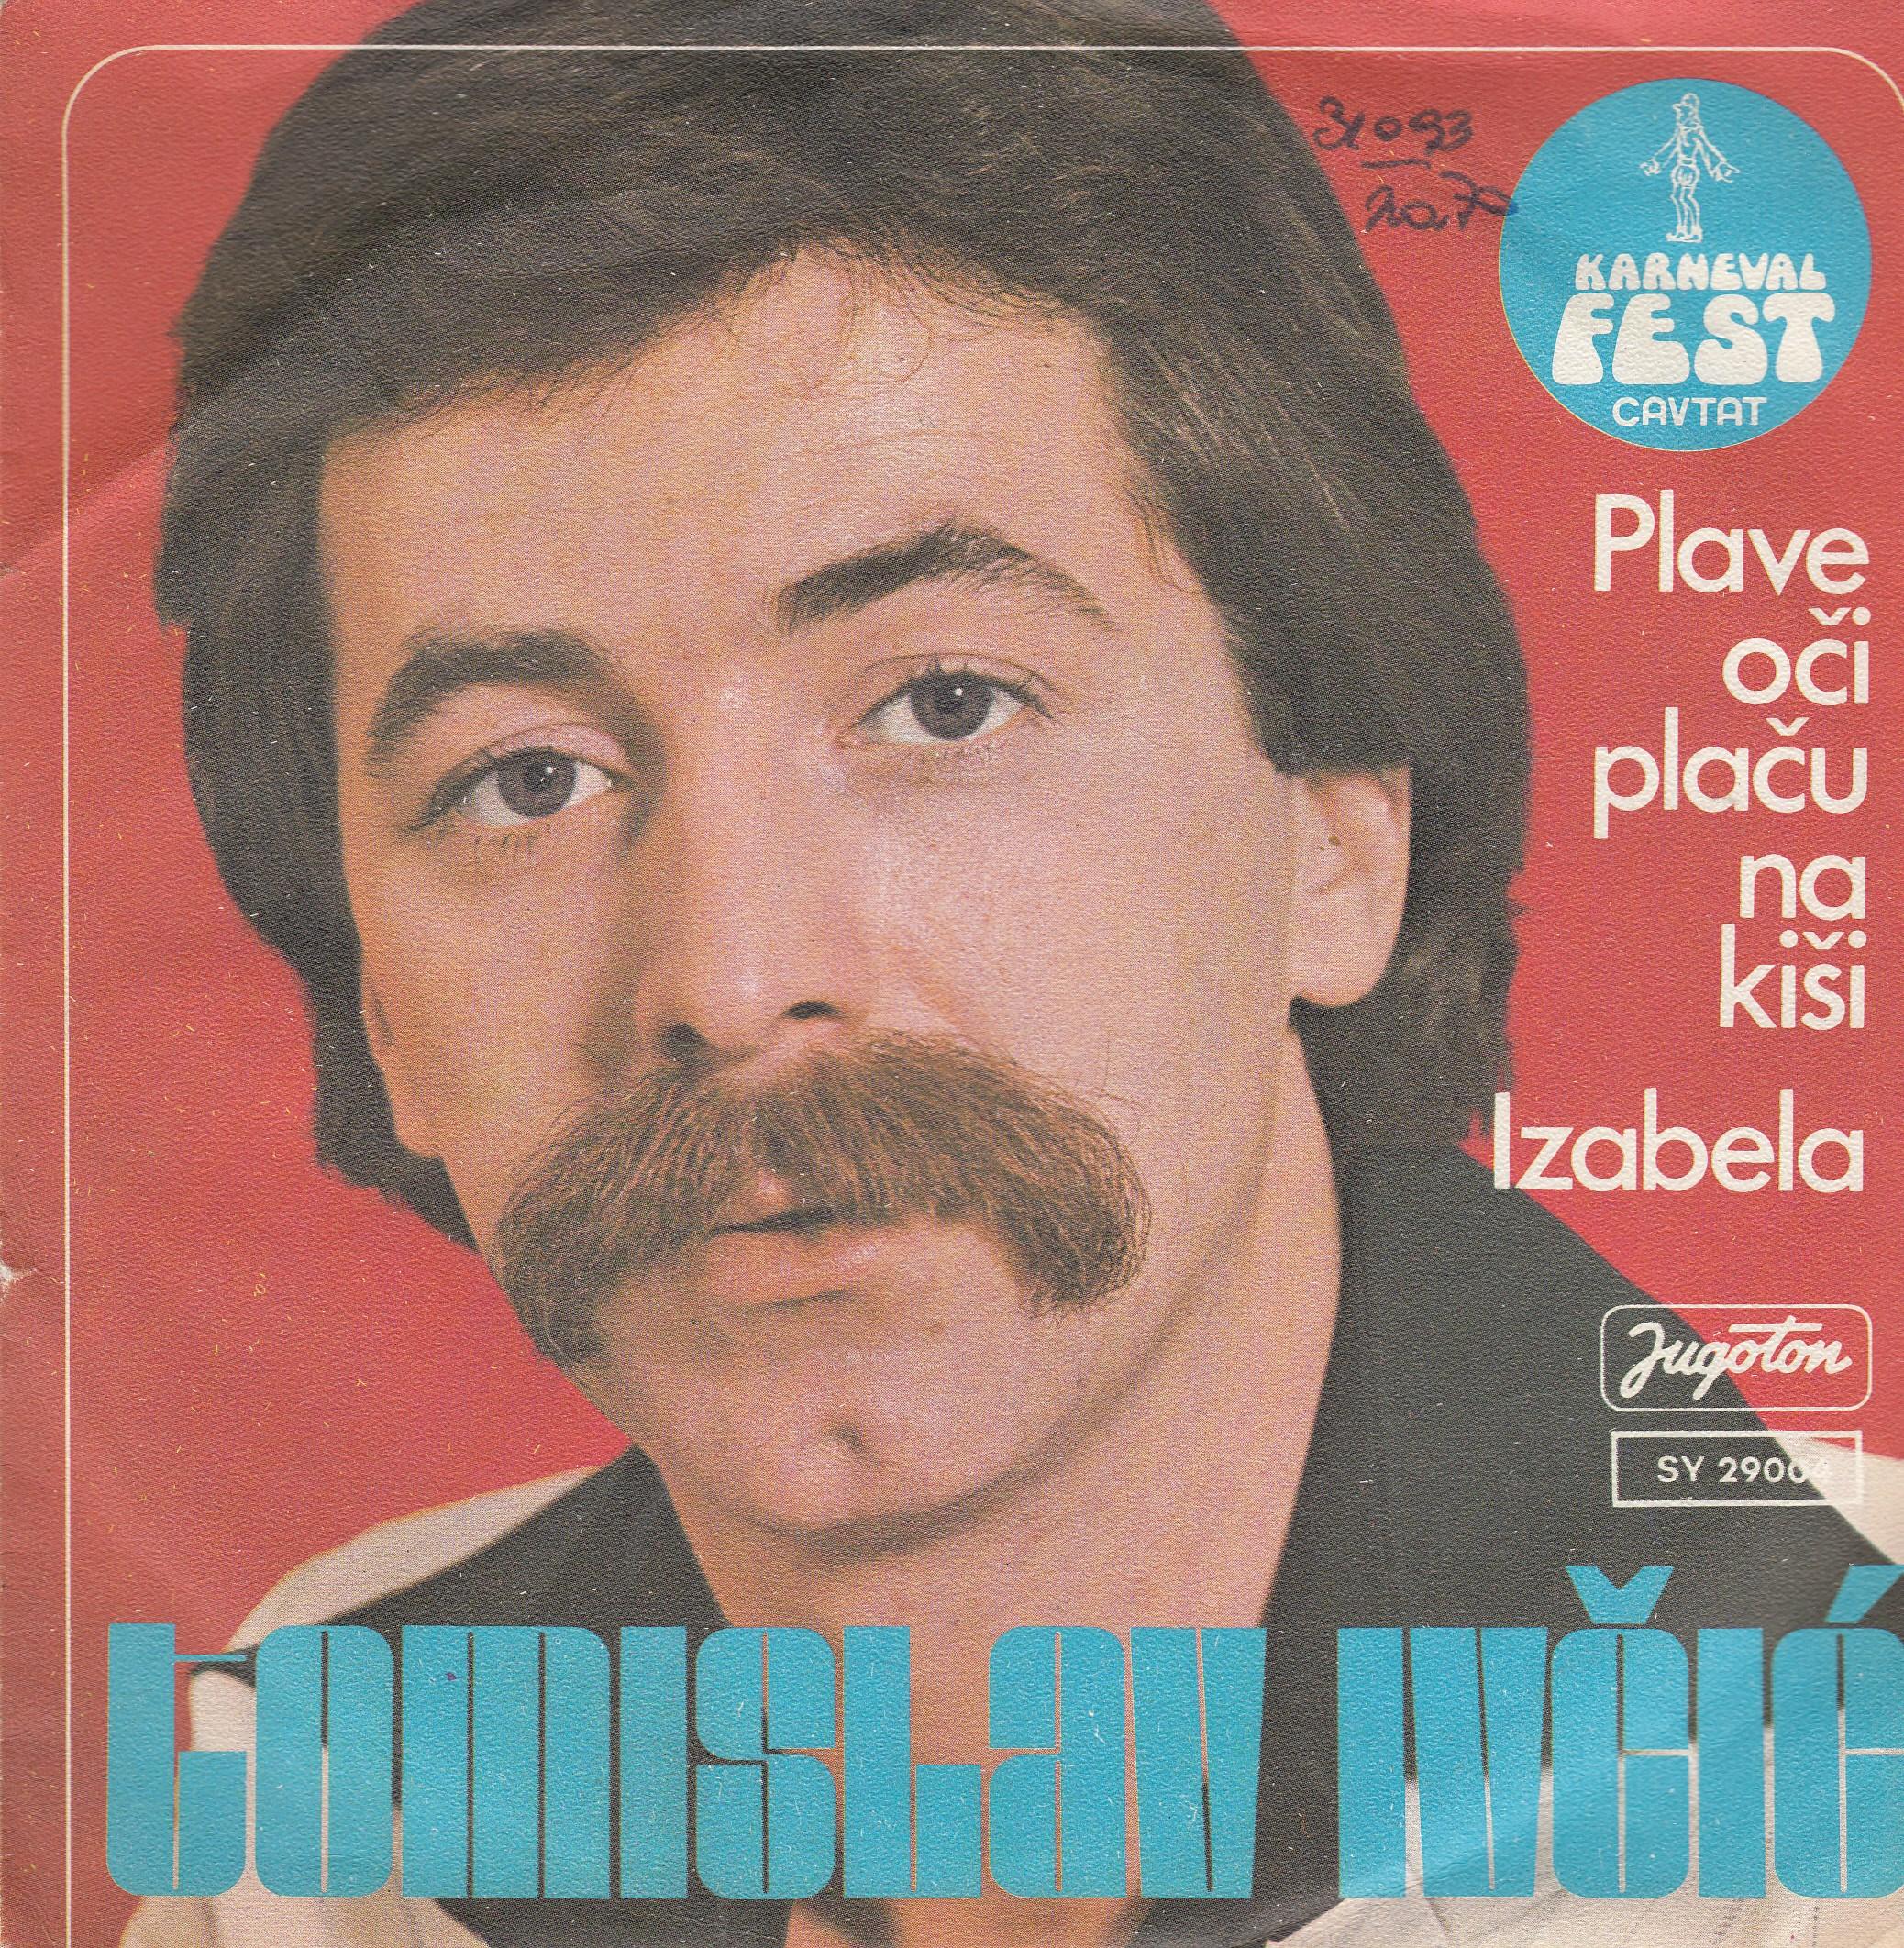 Ivcic Tomislav - Plave Oci Placu Na Kisi/izabela